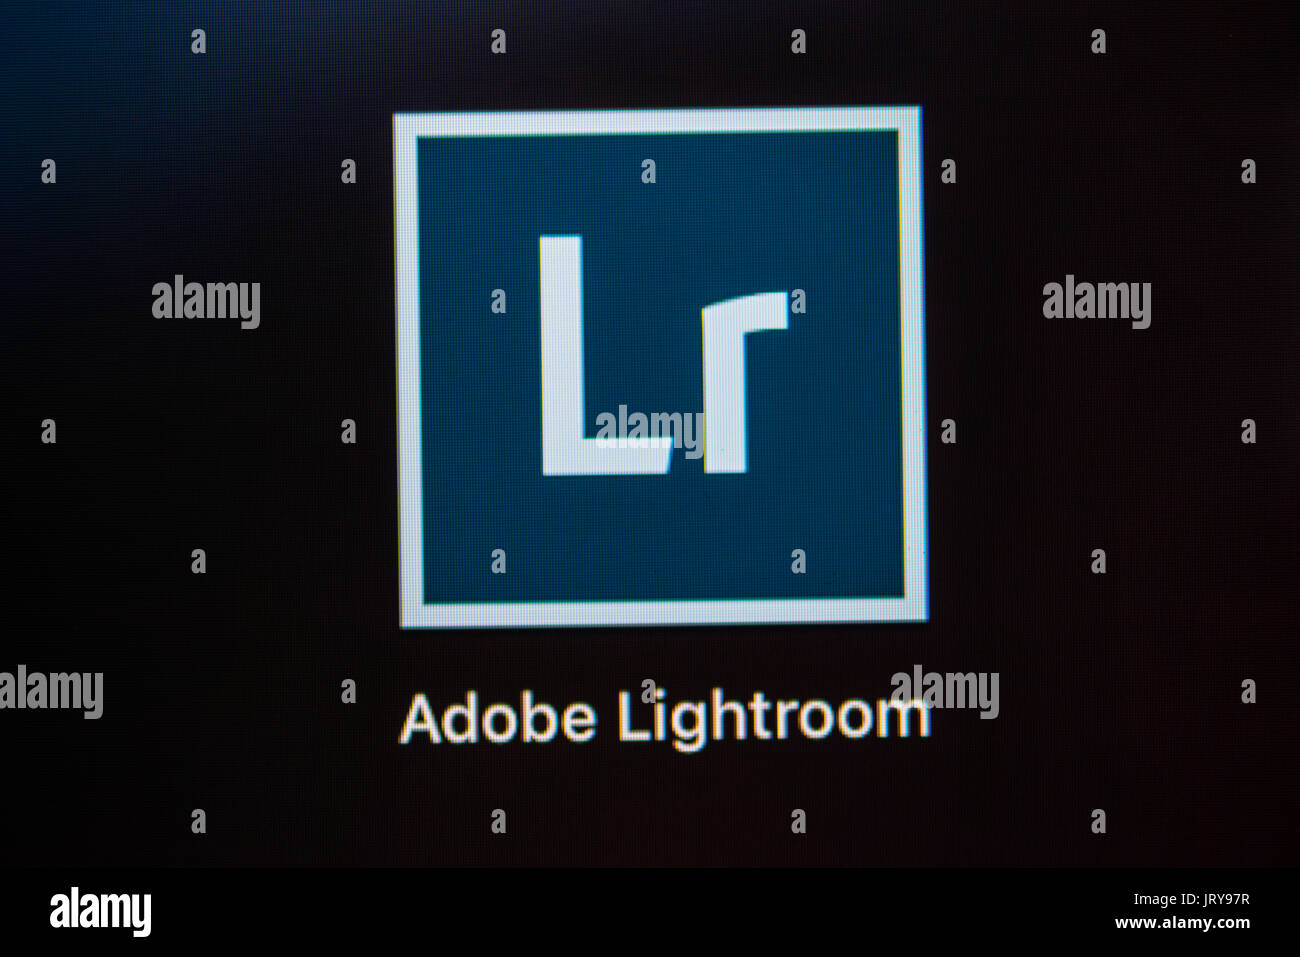 Icon, Logo, Adobe Lightroom, image editing program, image processing, macro shot, detail, full frame, screen shot - Stock Image